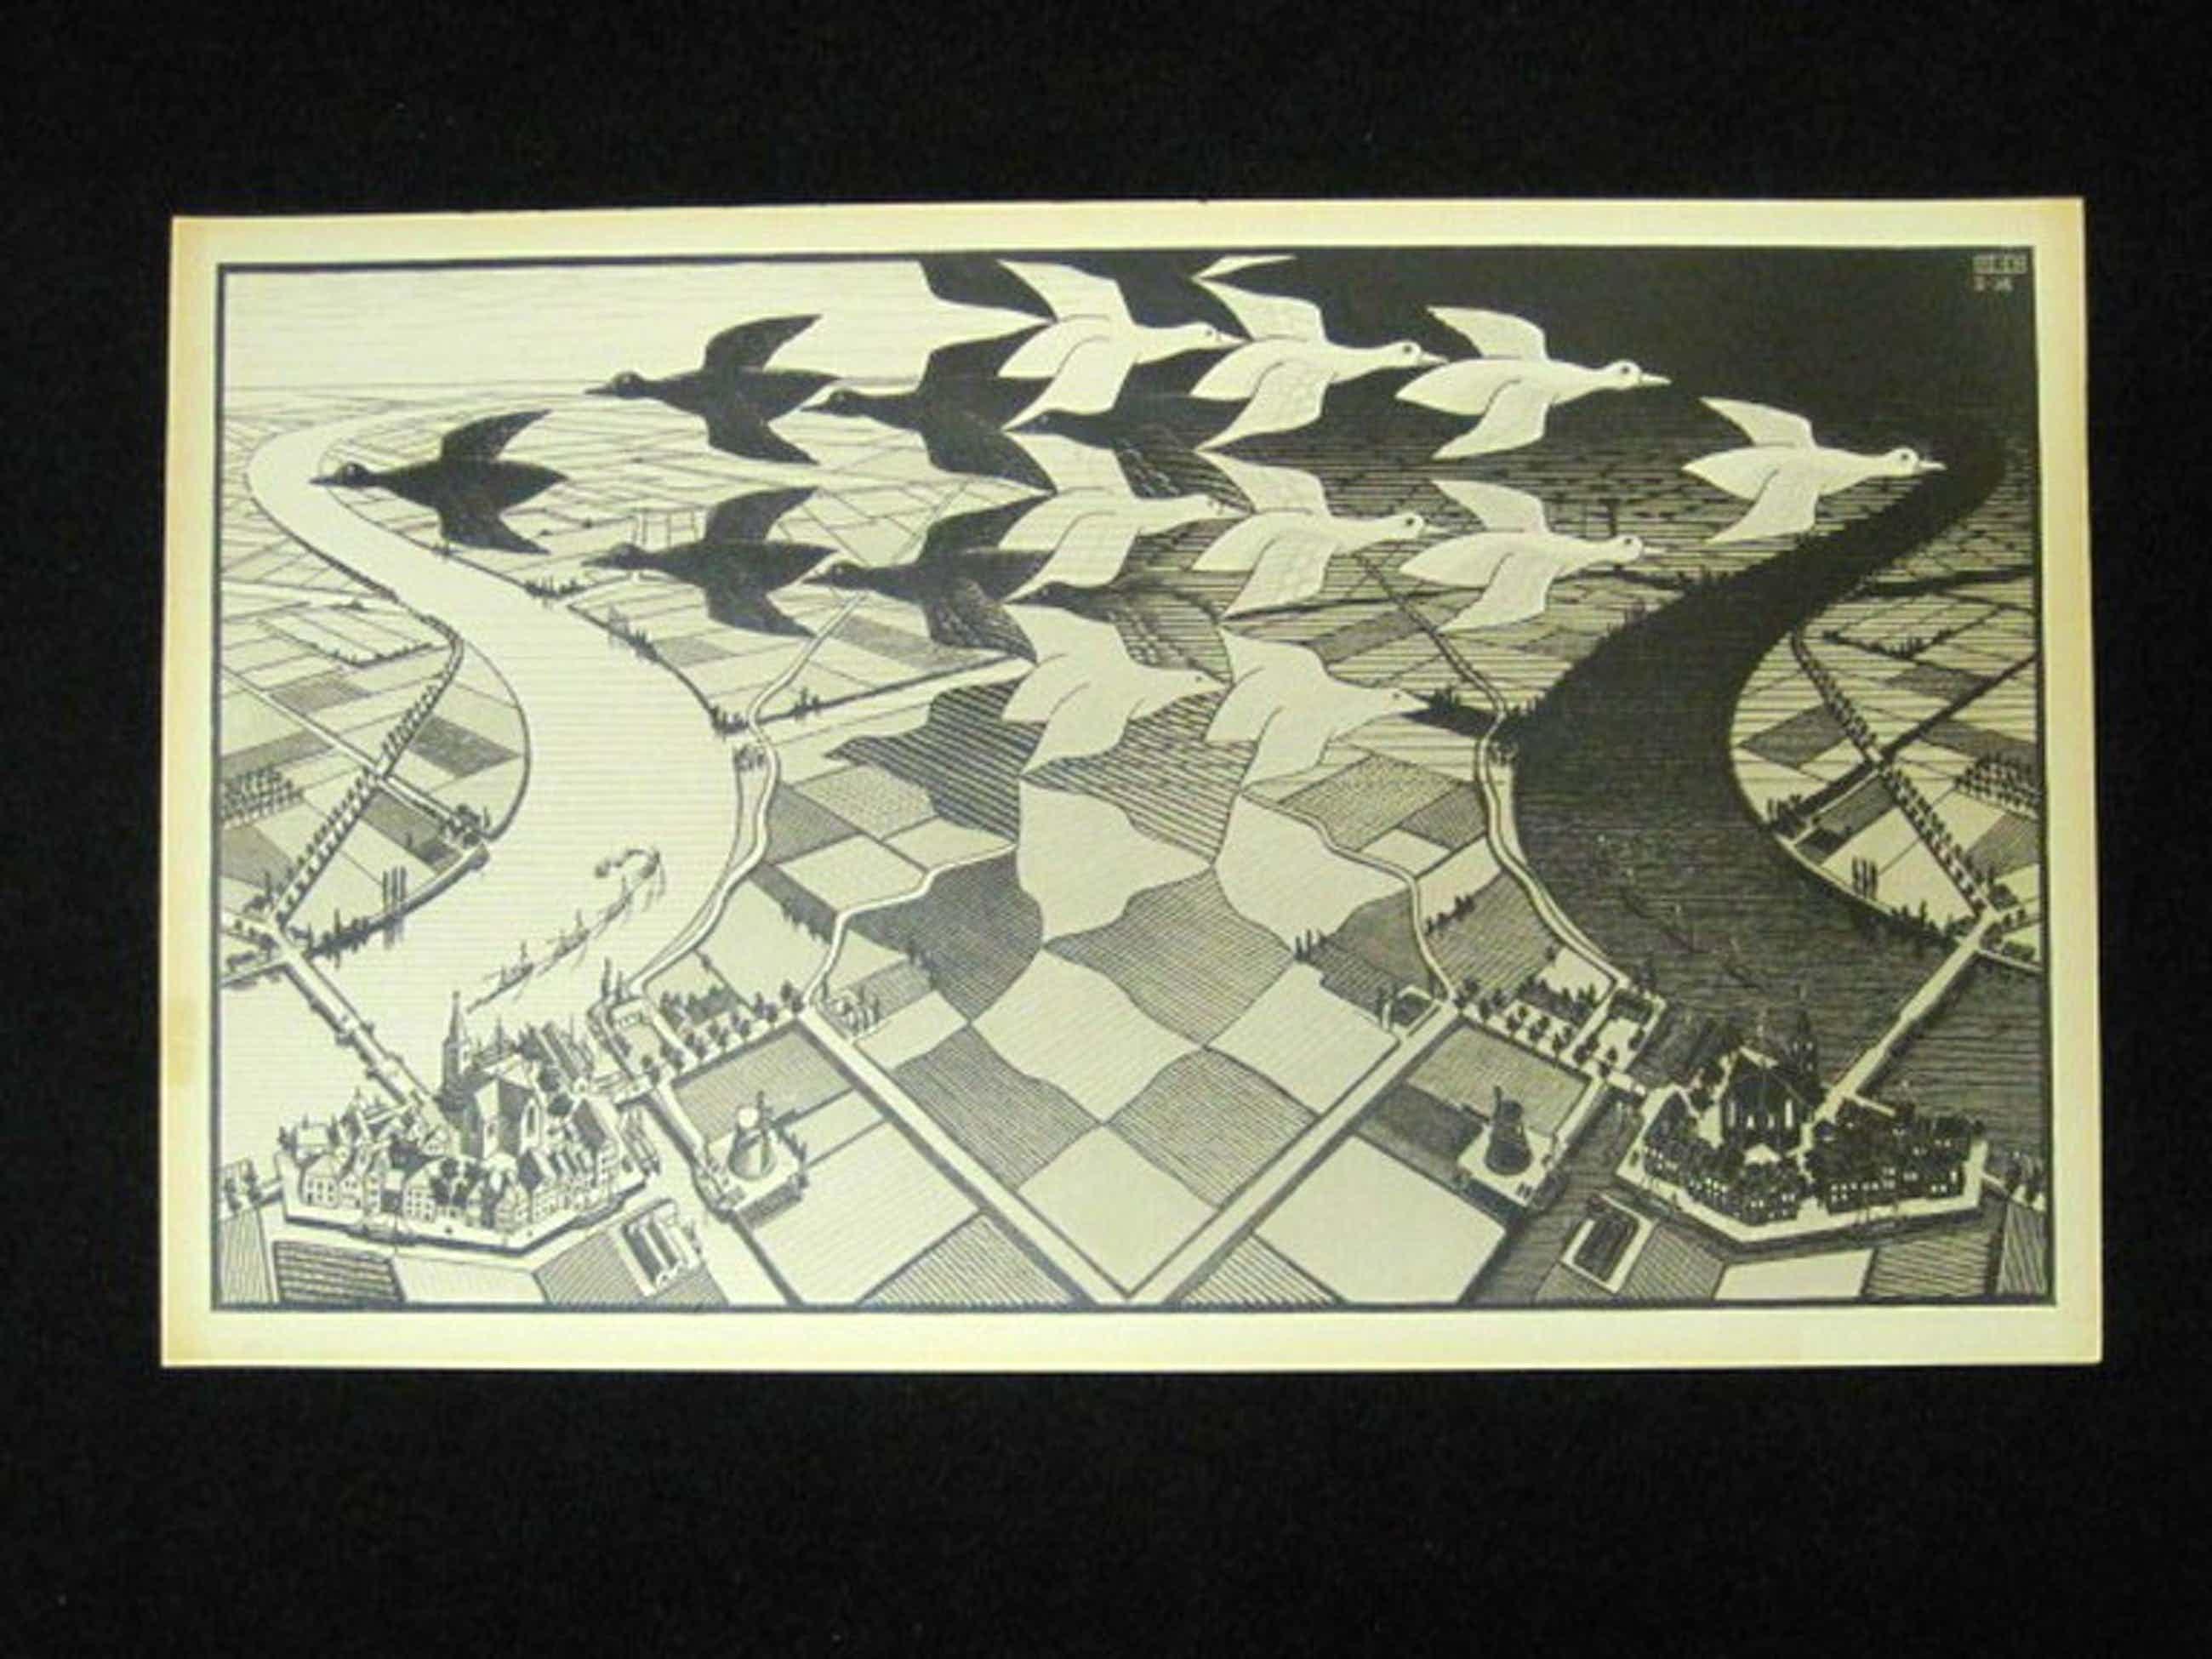 M.C.Escher1898-1972 oude lithografie  kopen? Bied vanaf 60!